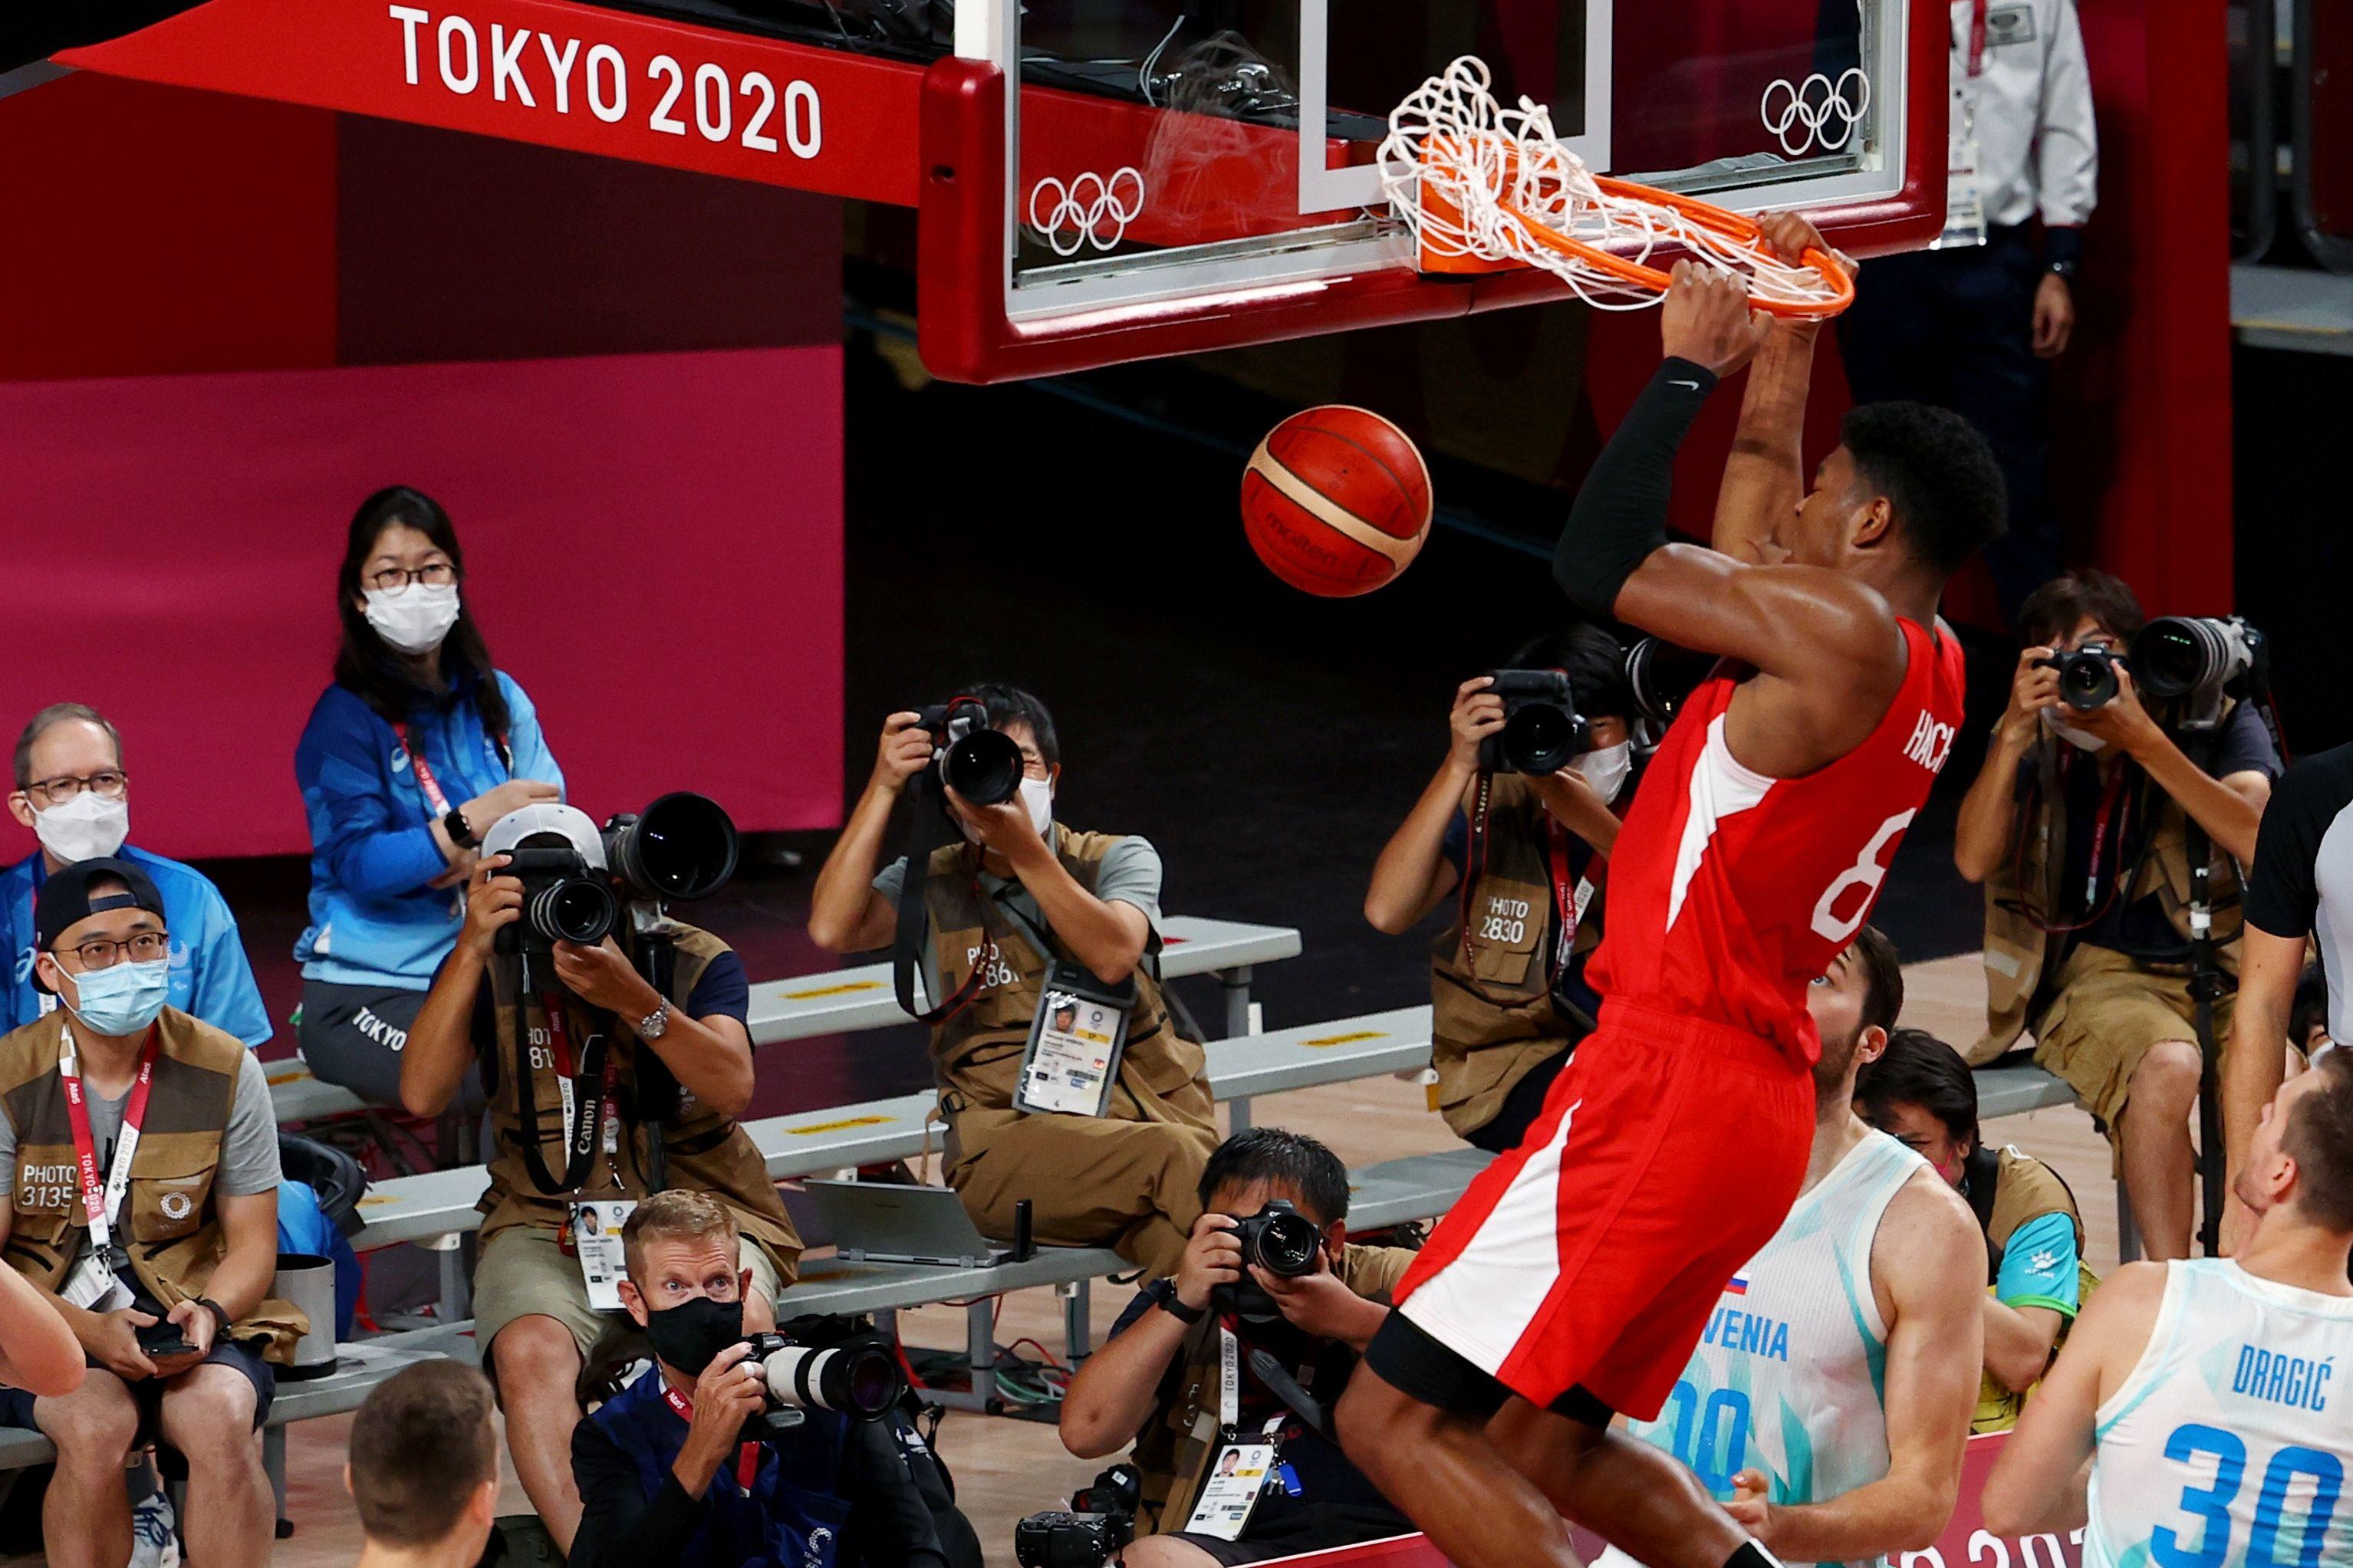 Tokyo 2020 Olympics - Basketball - Men - Group C - Slovenia v Japan - Saitama Super Arena, Saitama, Japan - July 29, 2021. Rui Hachimura of Japan scores a basket REUTERS/Brian Snyder